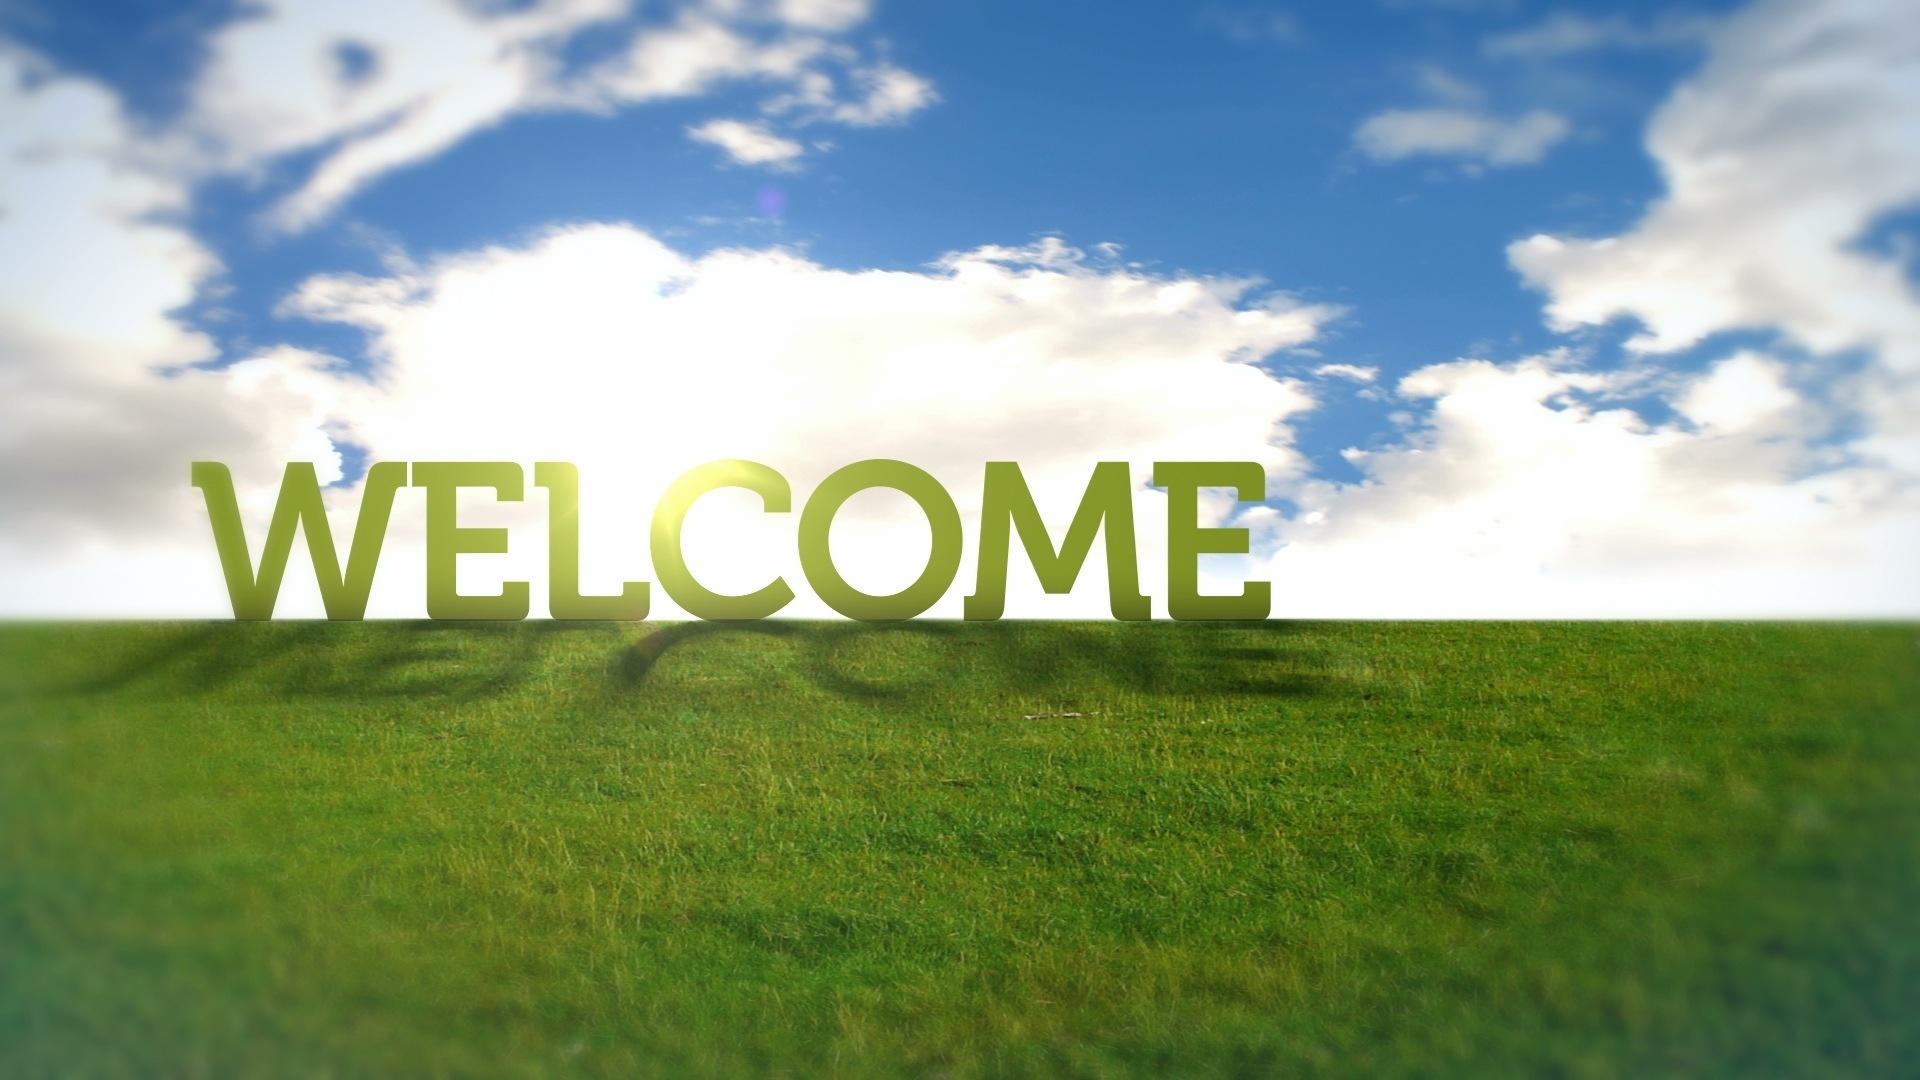 Welcome HD Wallpaper